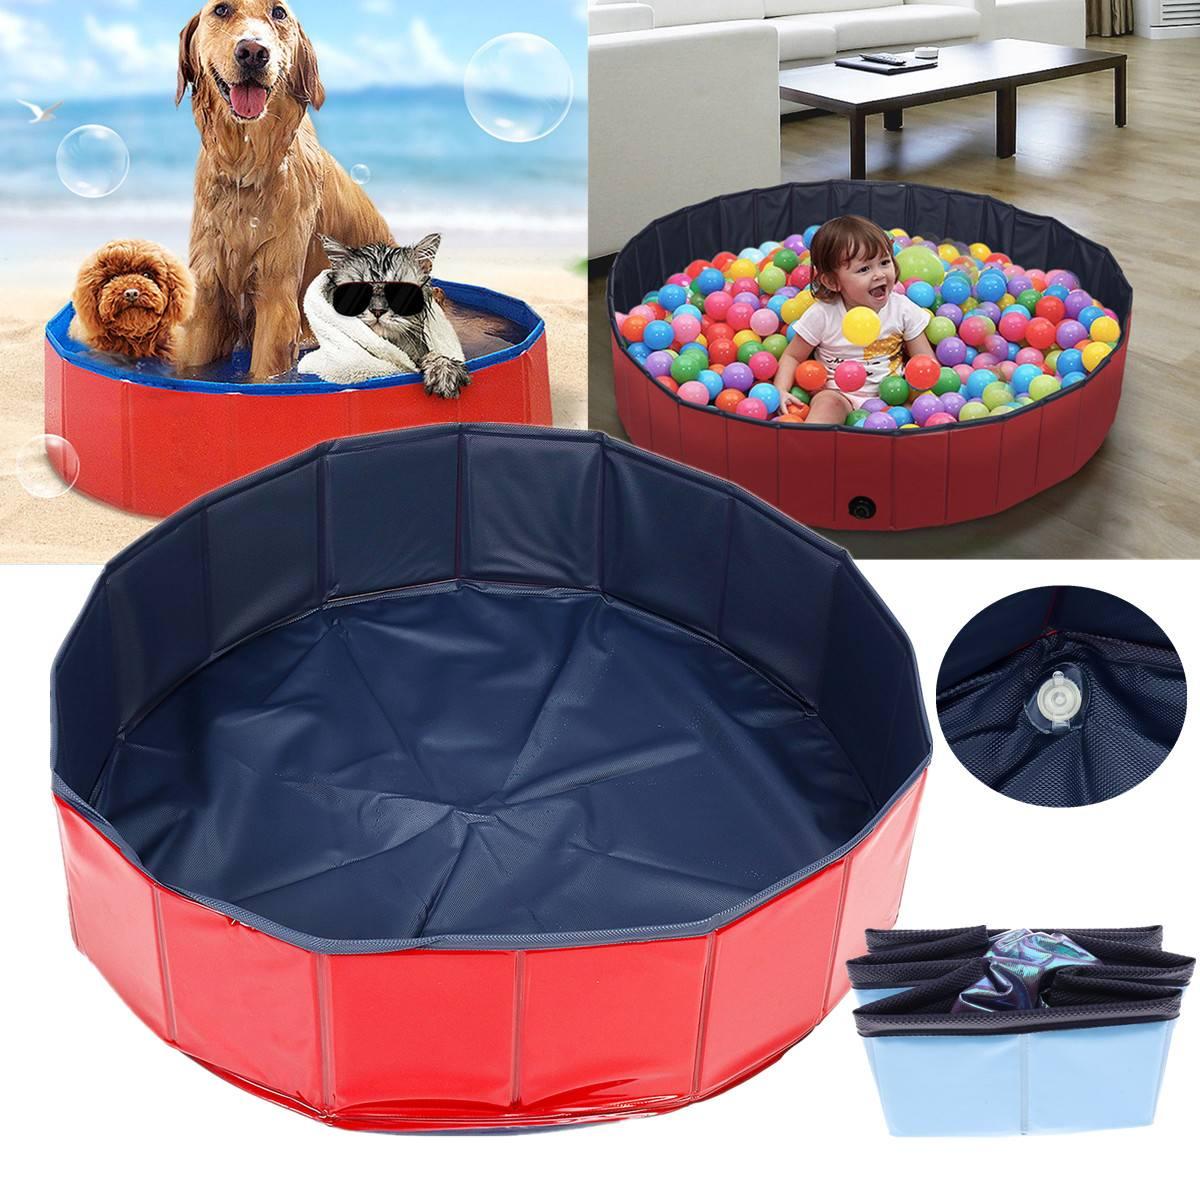 Roblue Pet Bath Dog Swimming Pool Foldable Paddling Pool Puppy Swimming Bathing Tub for Cat Dog